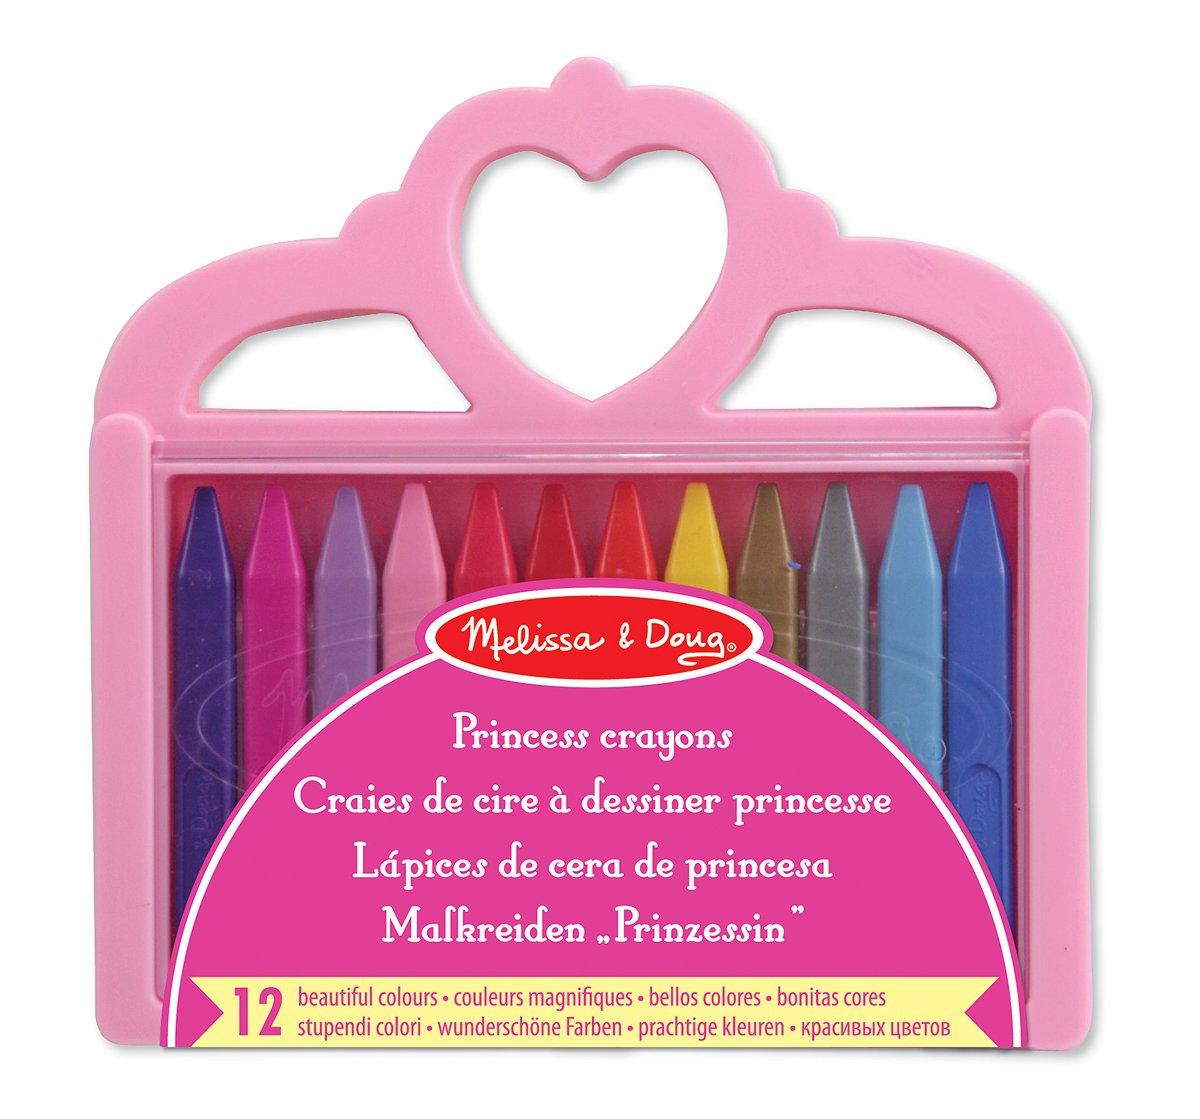 Melissa & Doug Princess Crayon Set - 12 Colours 14155